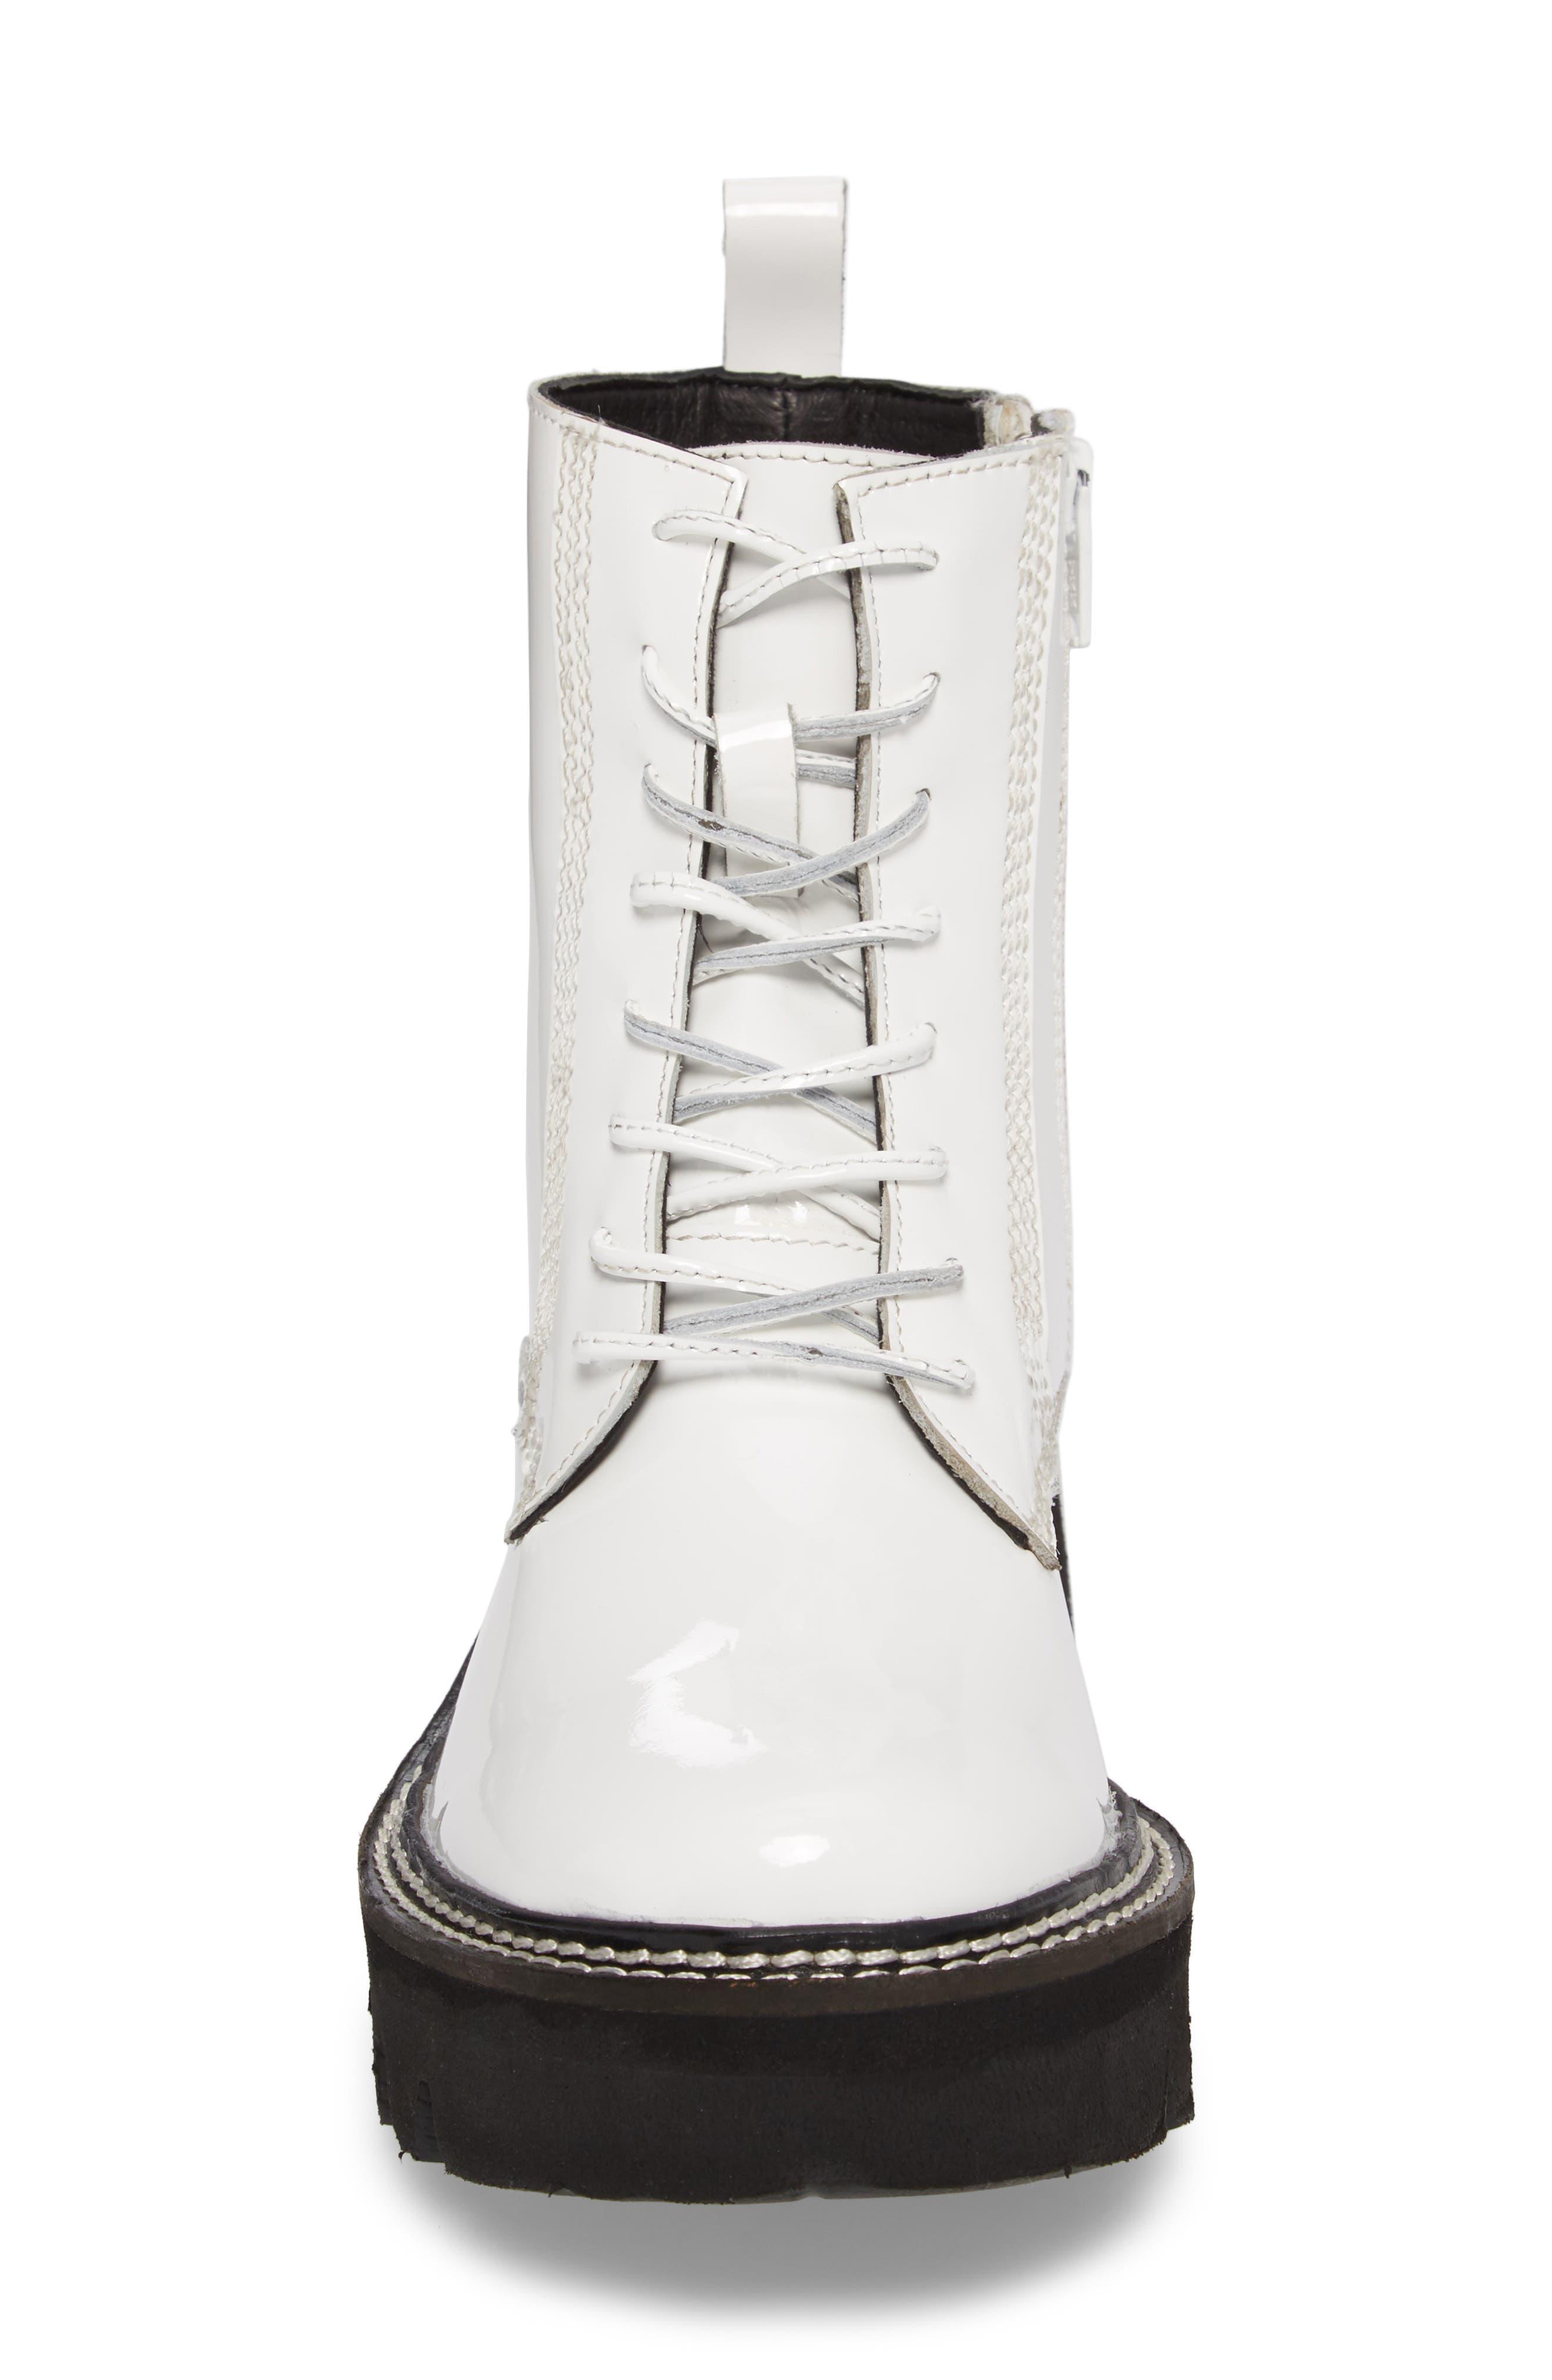 Agira Lug Boot,                             Alternate thumbnail 4, color,                             White Patent Leather